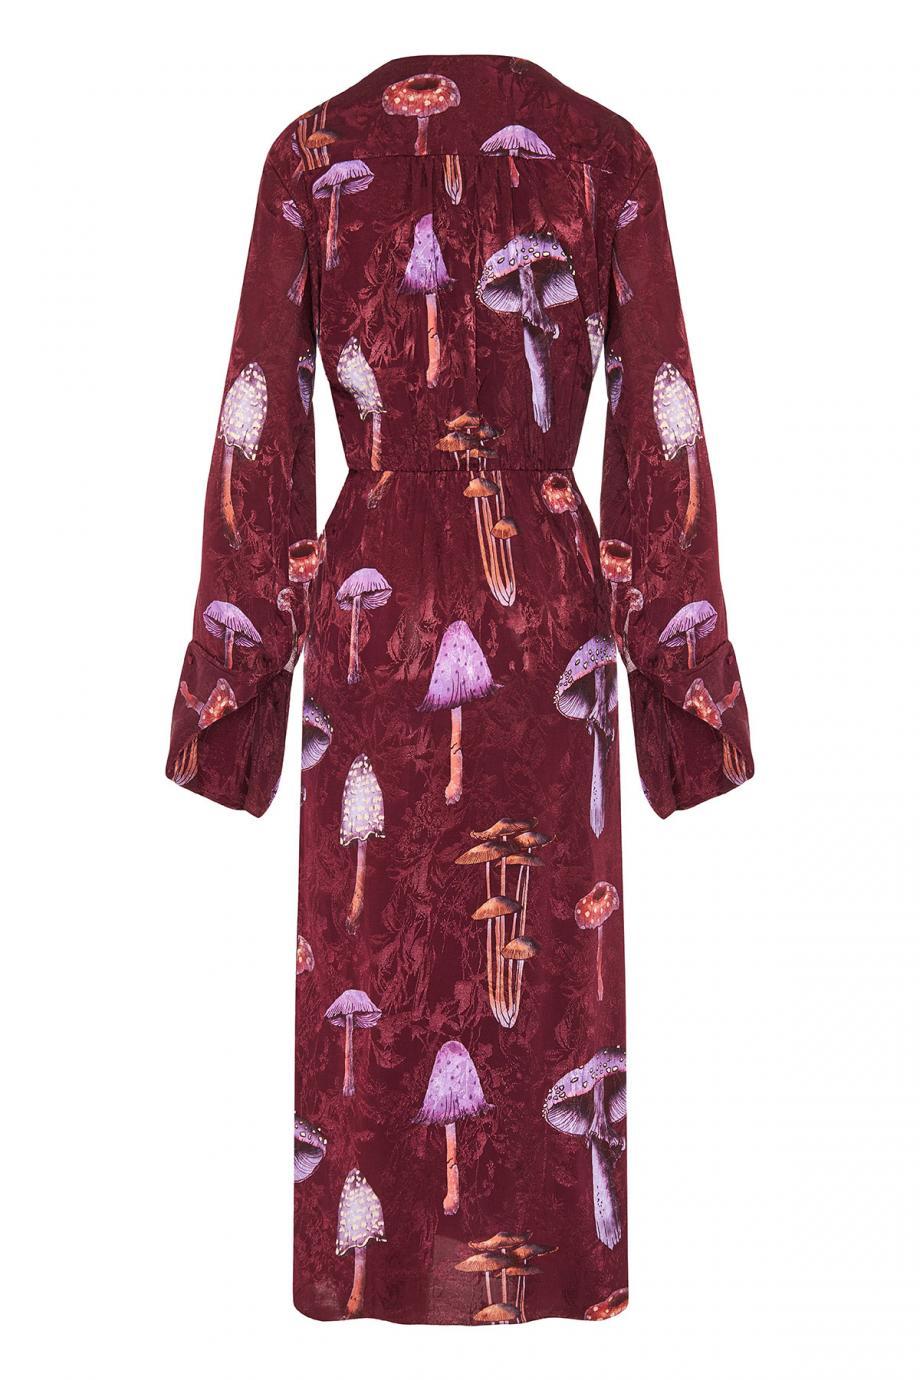 The Hidden satin-jacquard midi dress